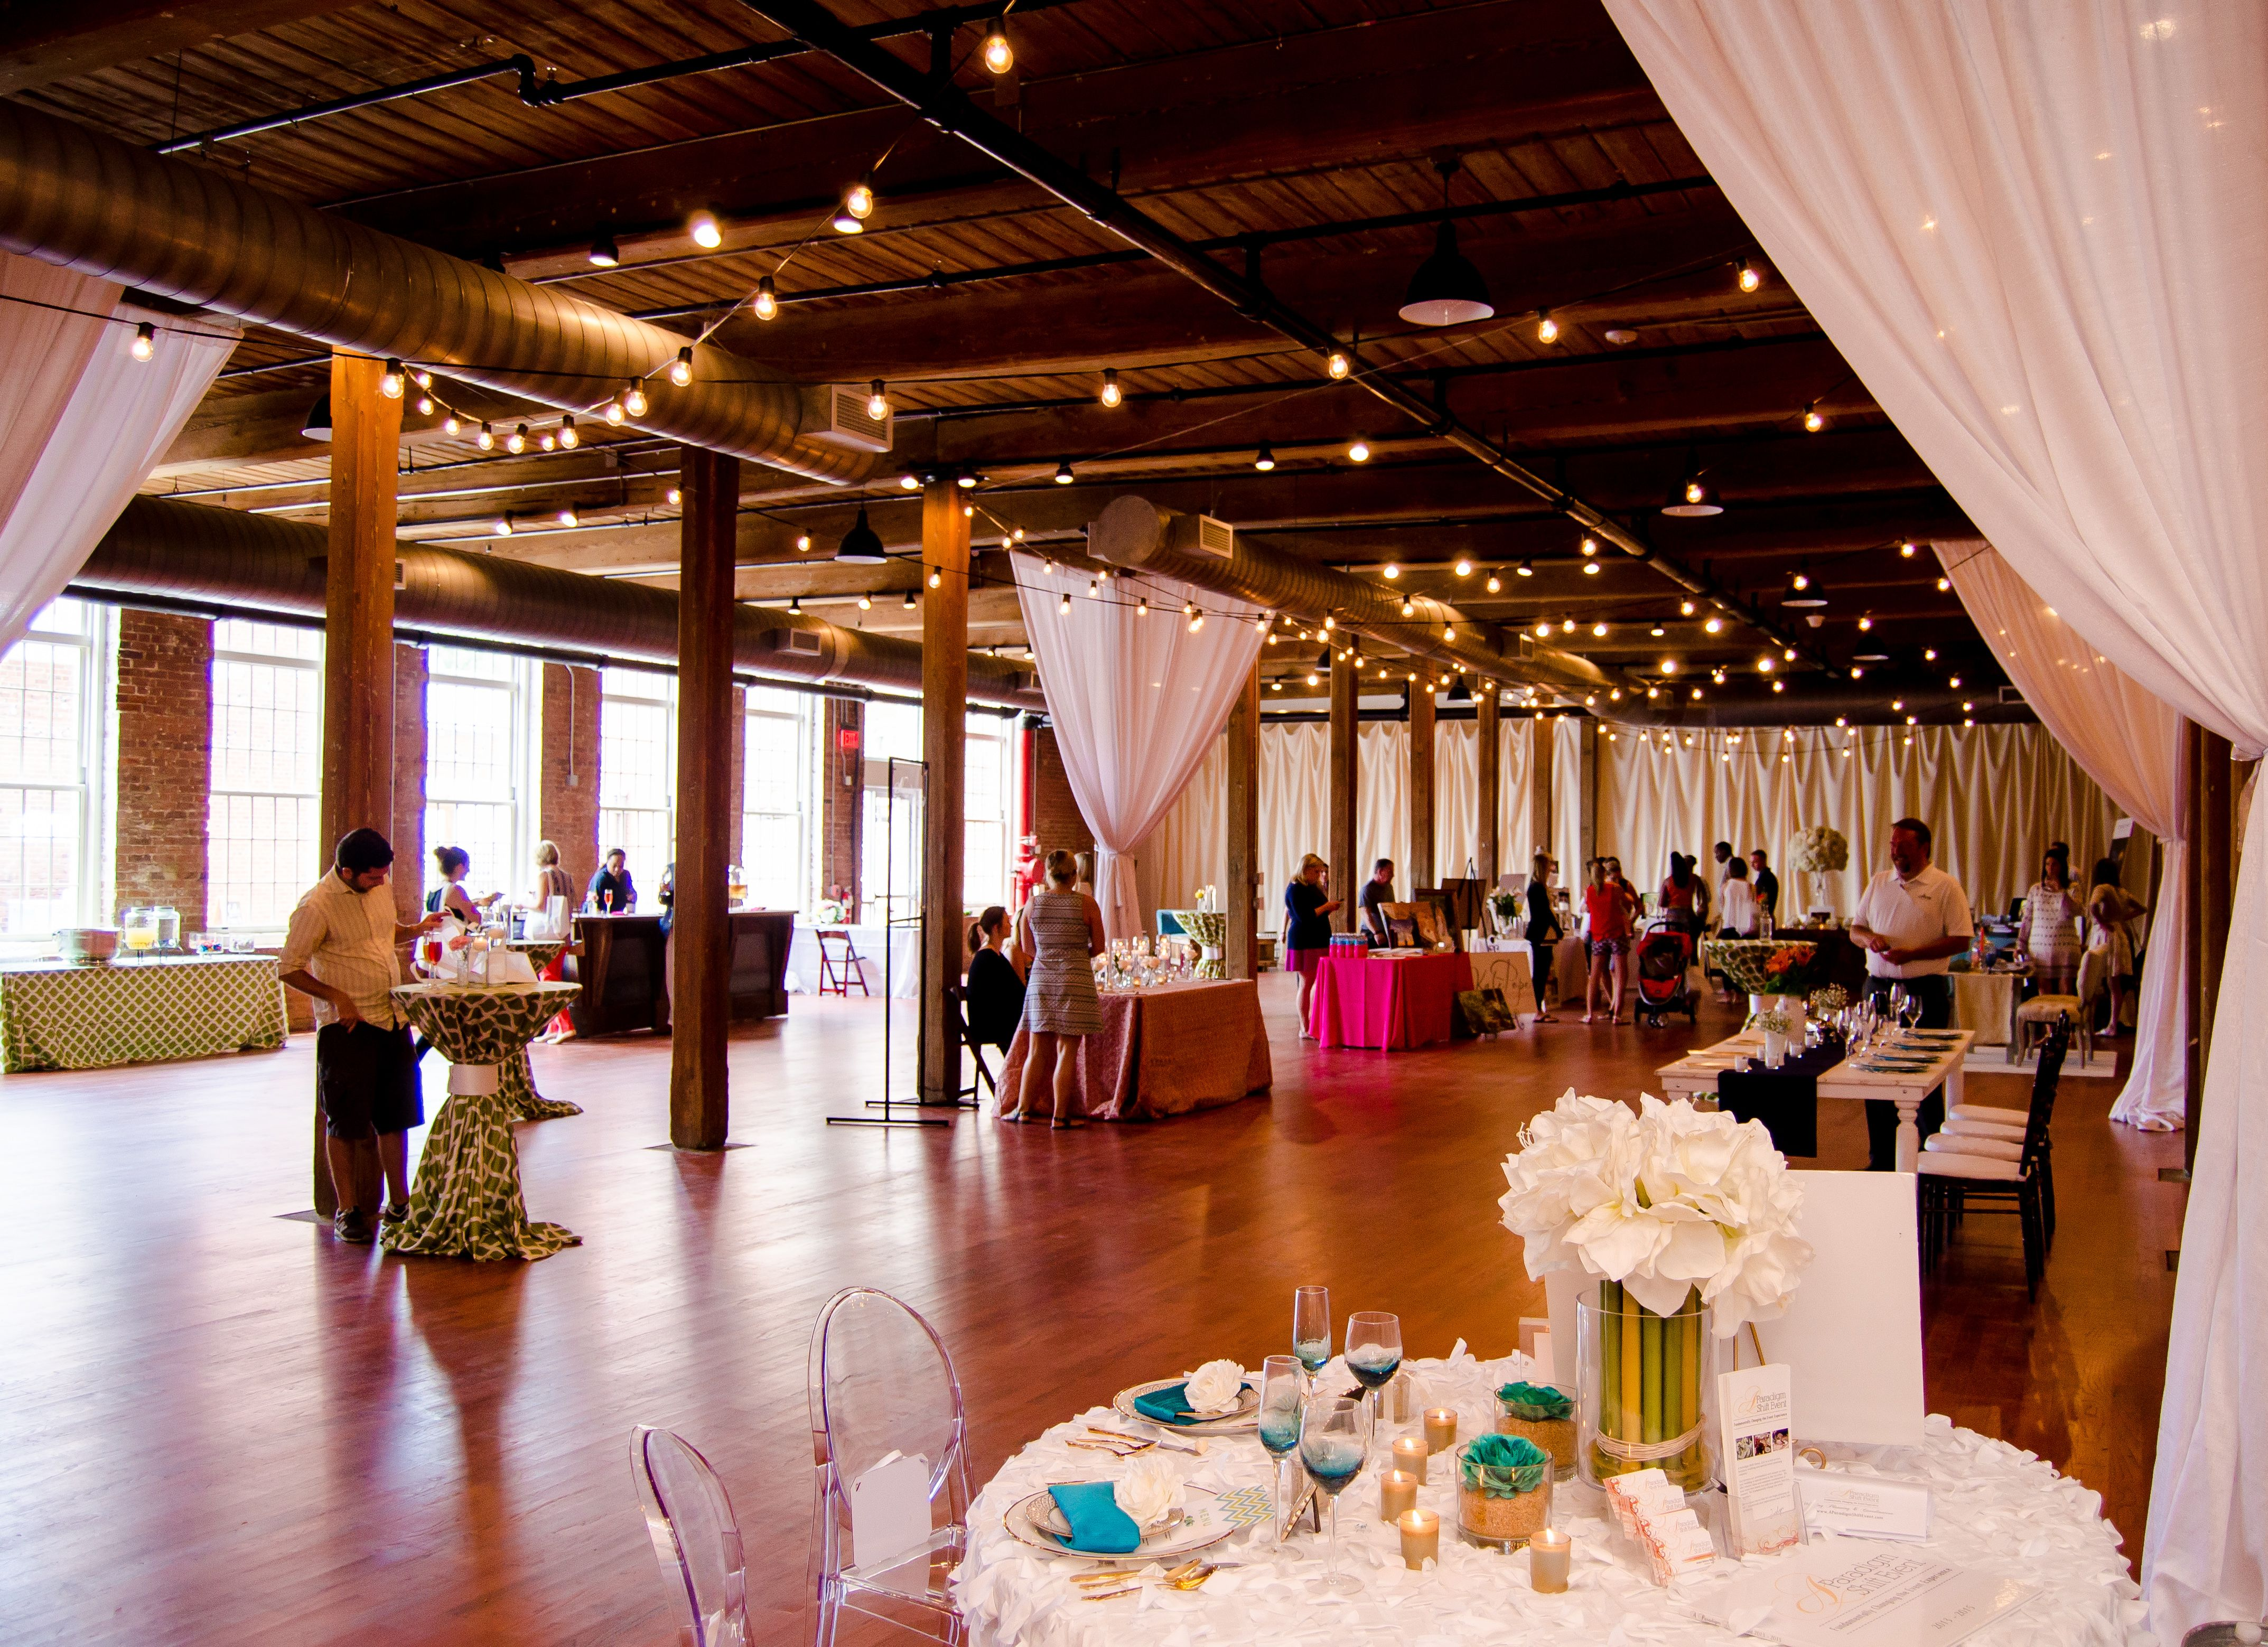 Beautiful room inside the venue   Beautiful wedding venues ...